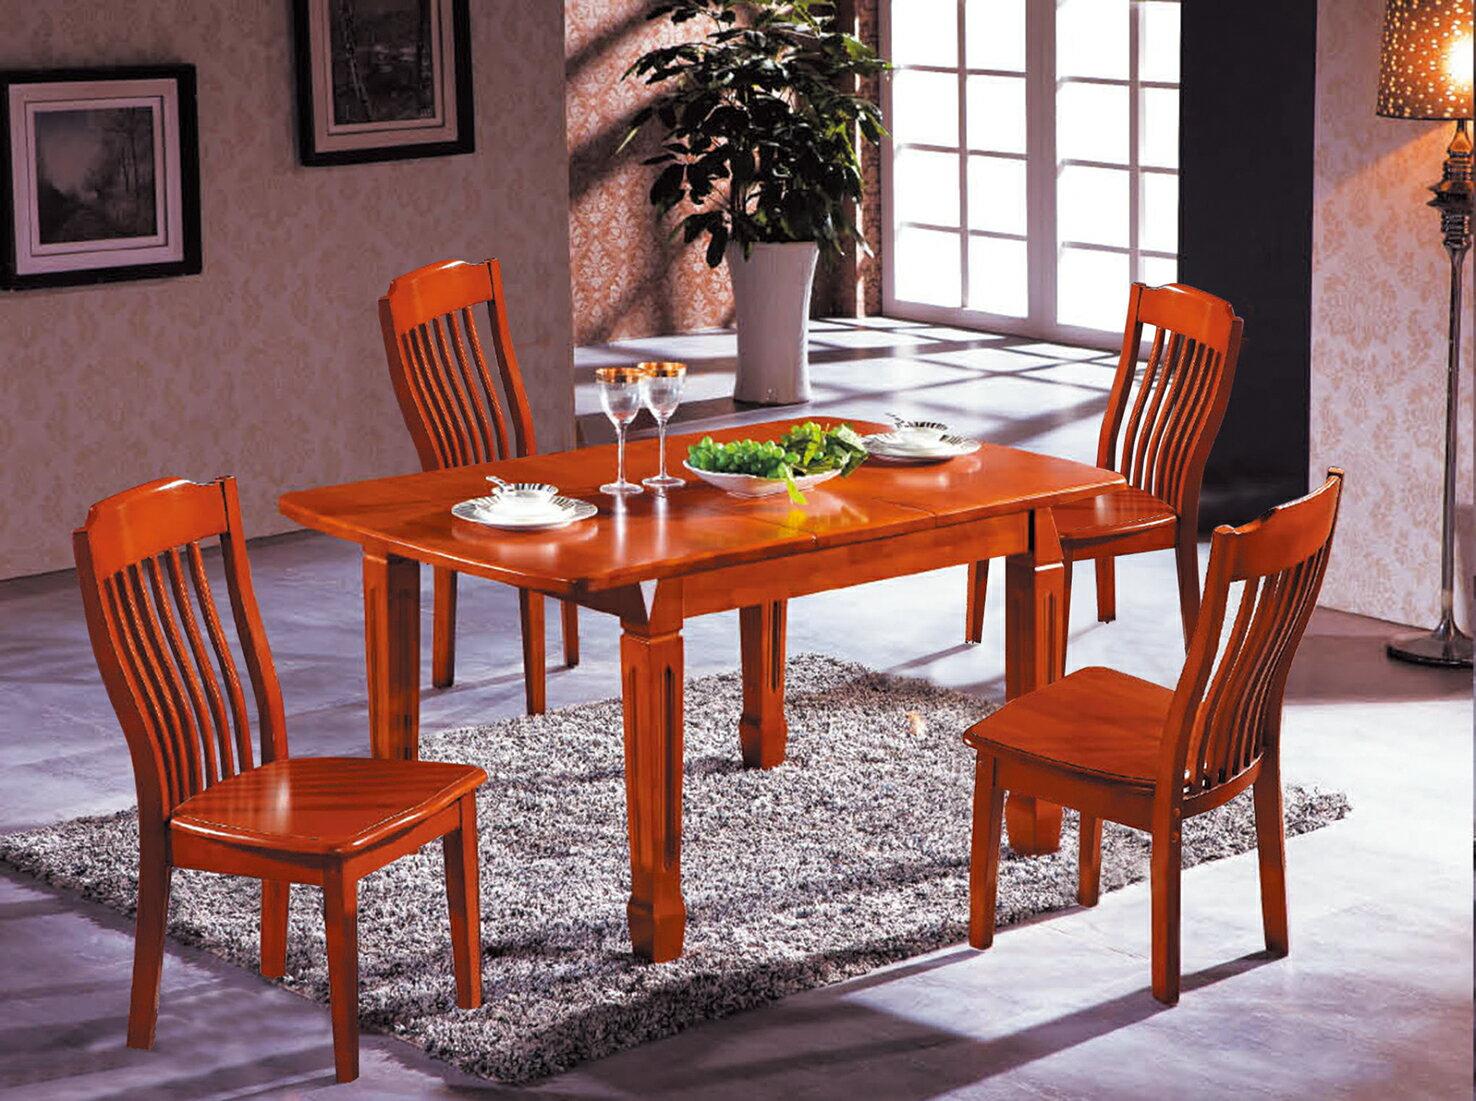 【 IS空間美學】606實木長餐桌(可收合)+919實木餐椅(1桌4椅)